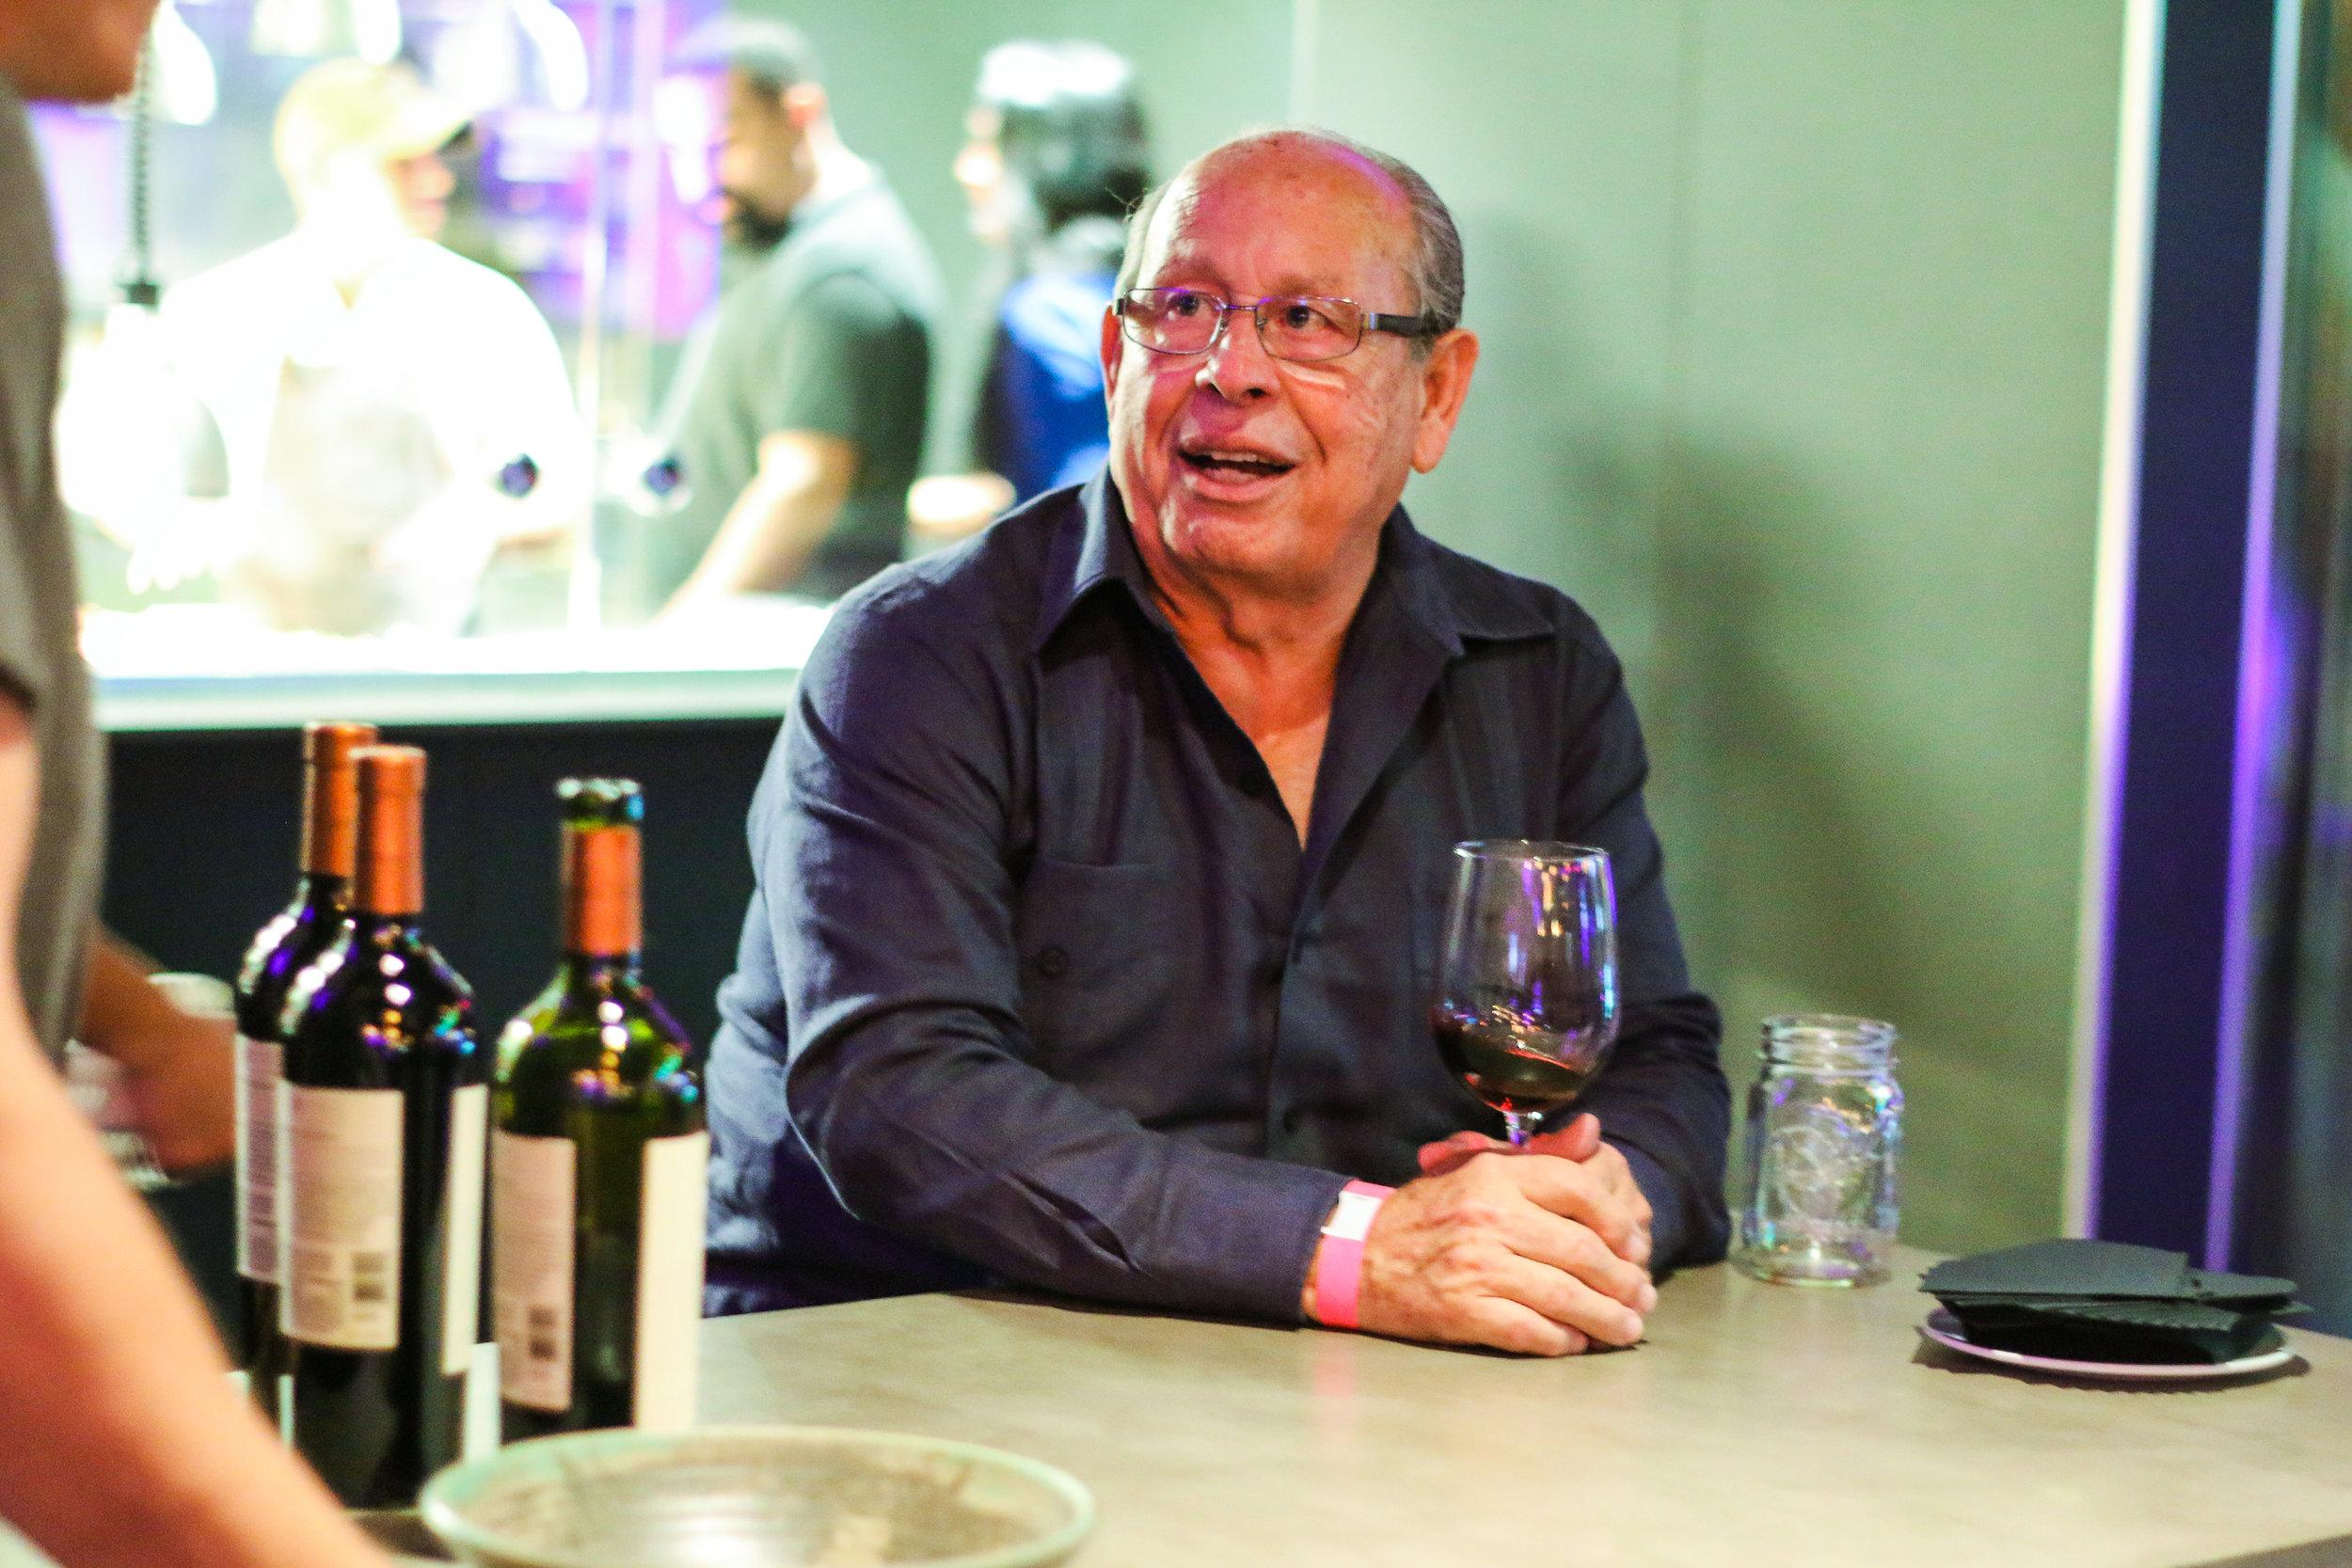 Cork & Fork-320 Gastrolounge-Miami Wine Events-Wine Tasting Miami-30.jpg